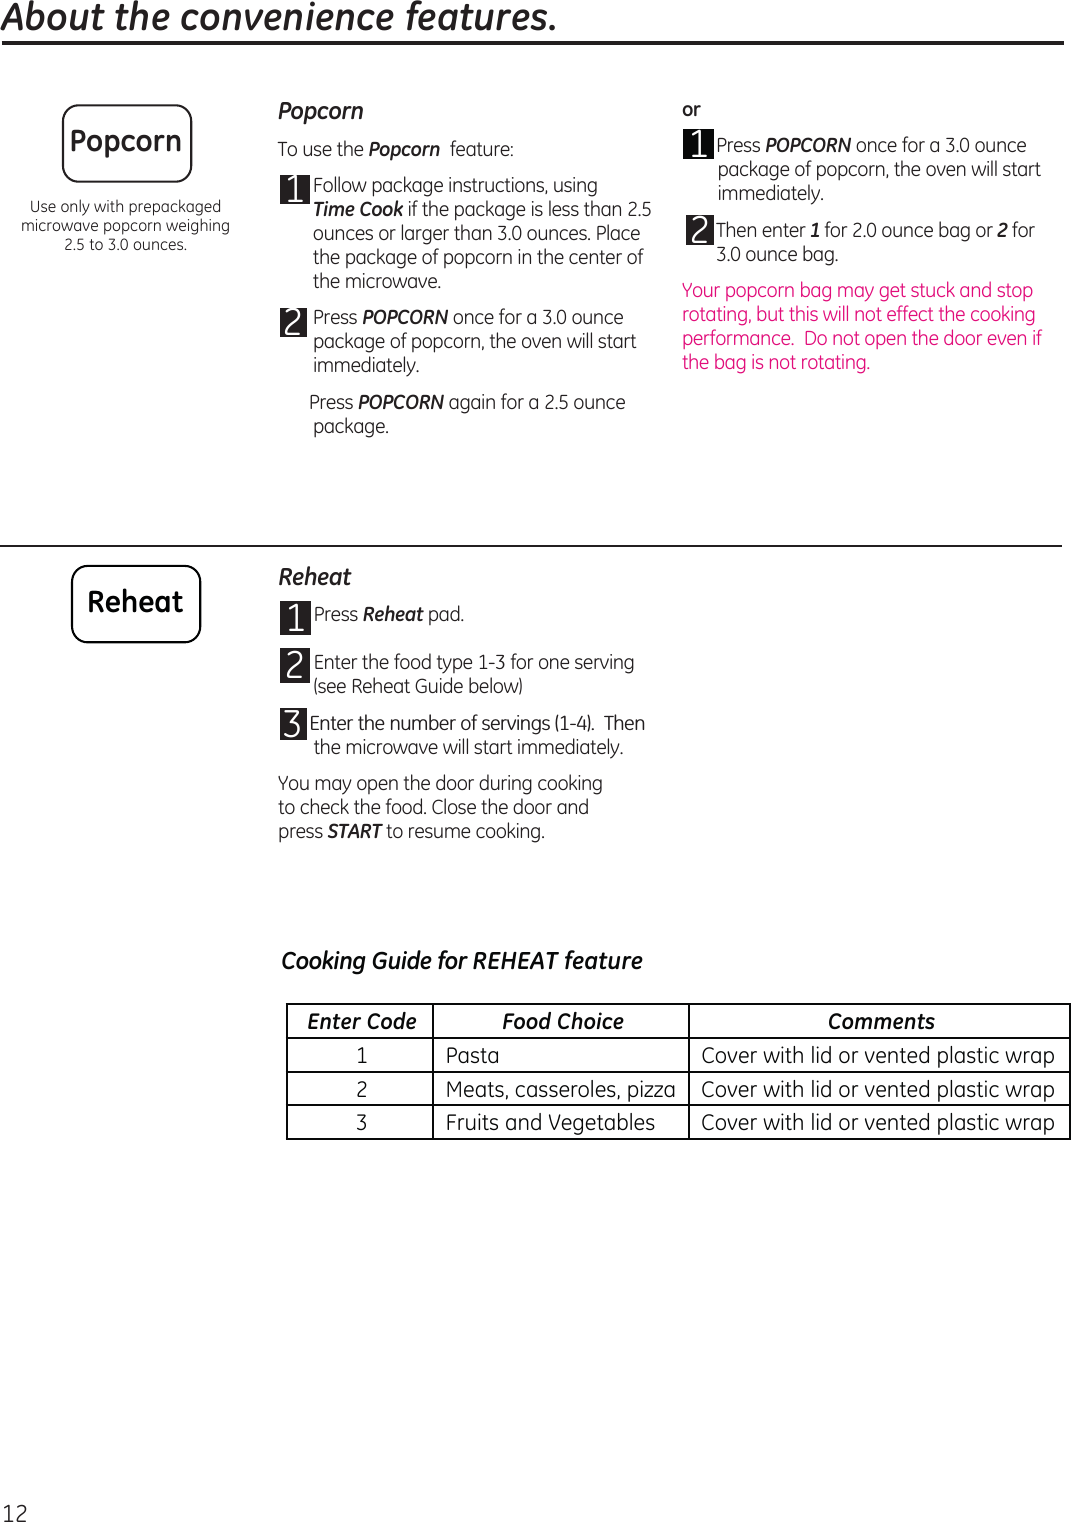 GE JEM3072DH1BB 49 40733_HiRes User Manual MICROWAVE Manuals And